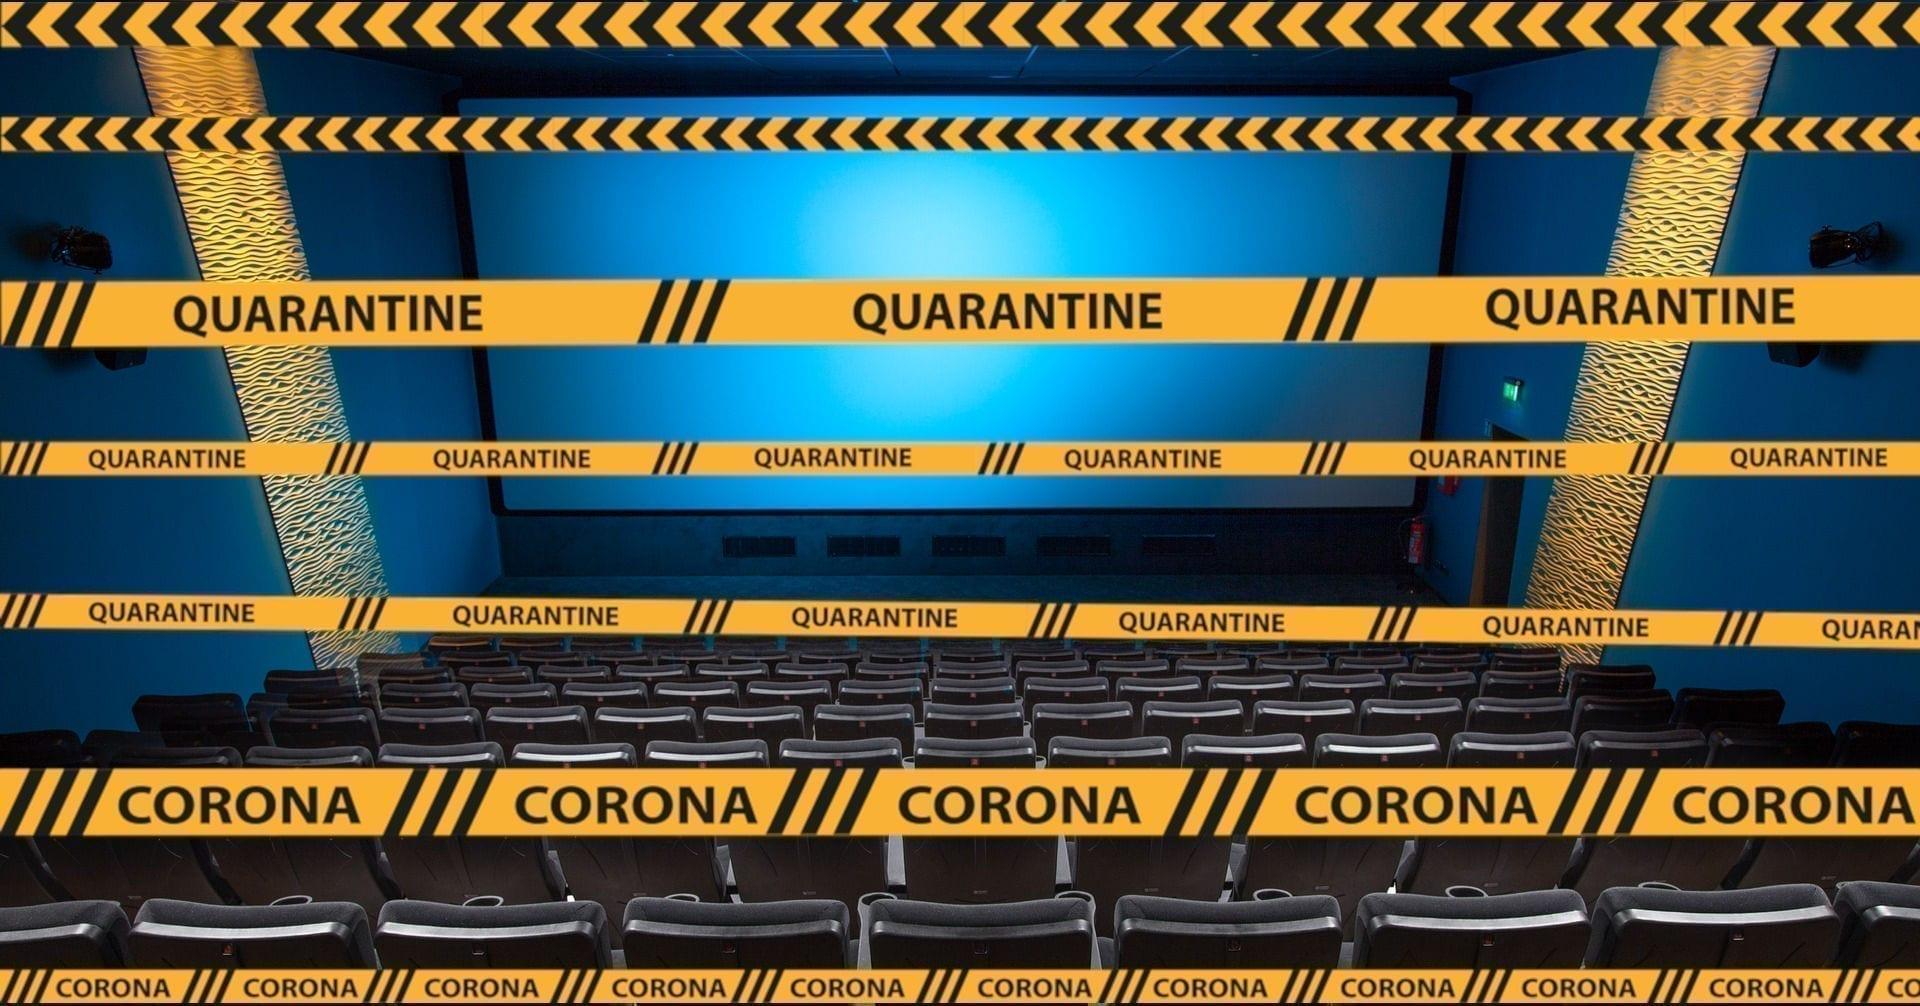 Kino wegen Corona gesperrt